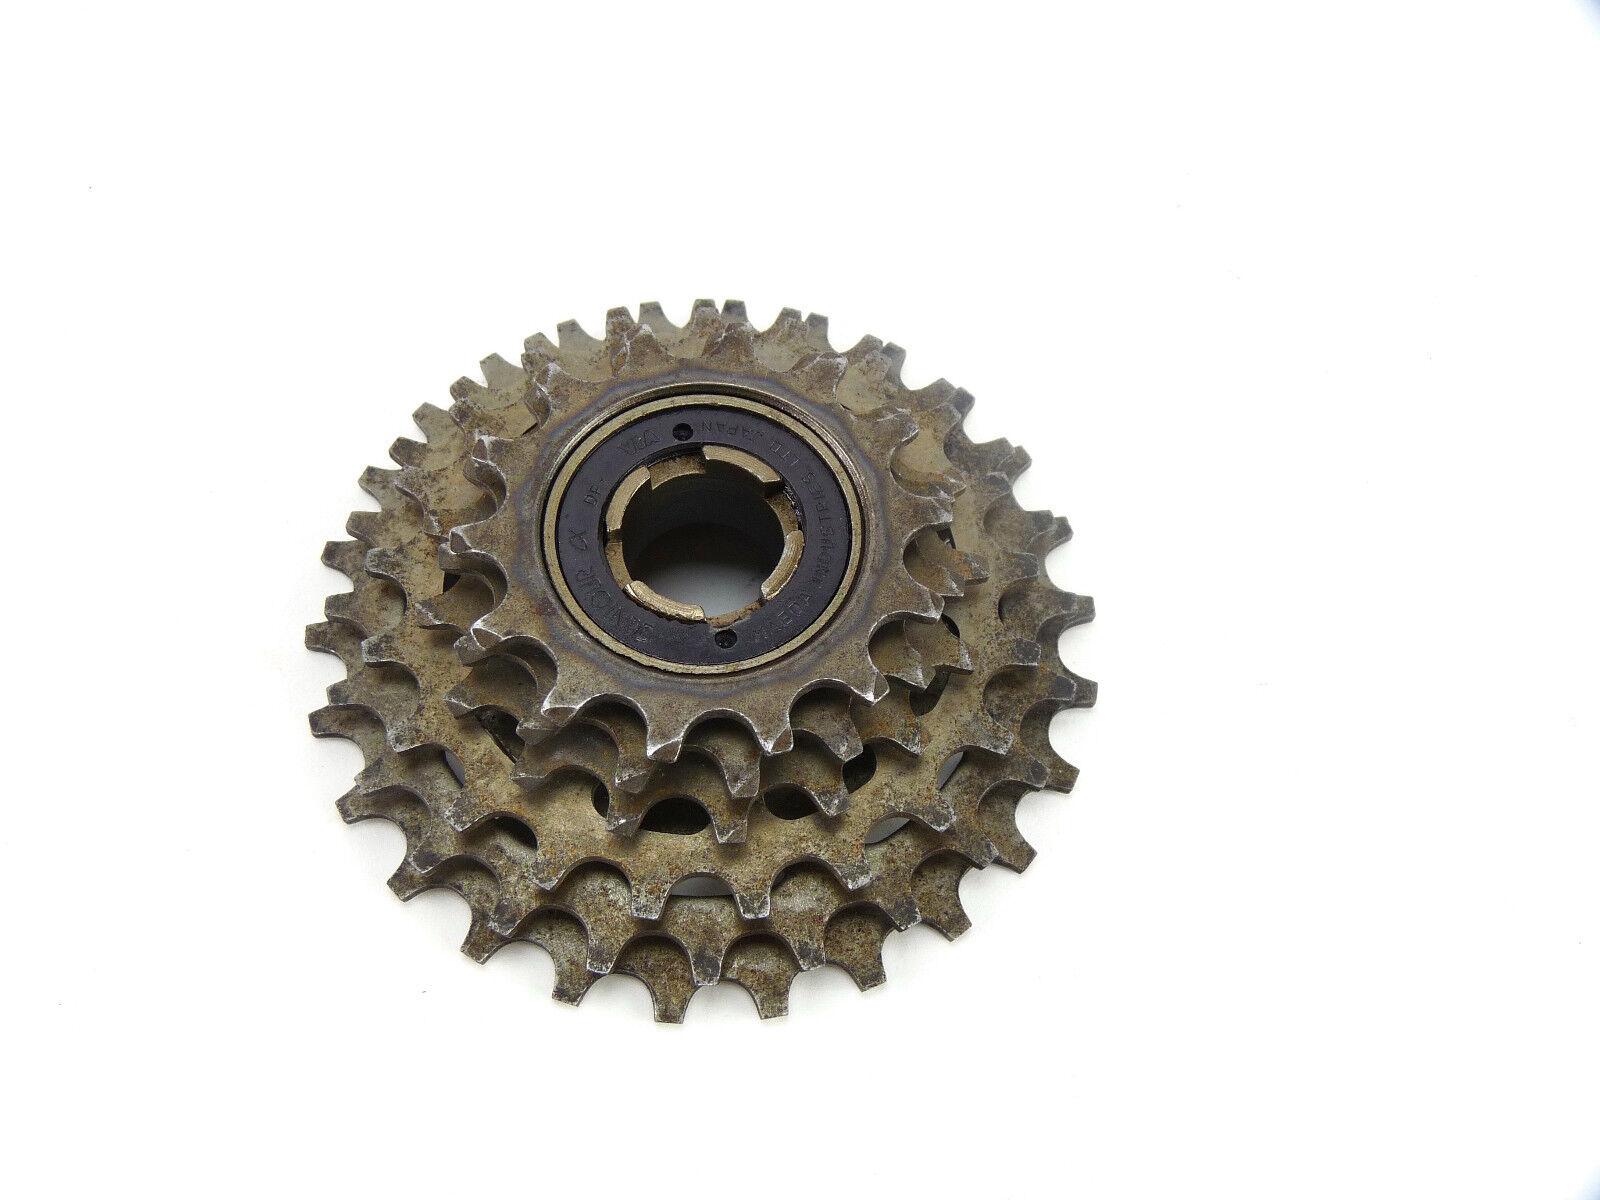 Suntour freewheel Accushift 6 speed 14-28 Vintage Bicycle  Alpha Winner NOS  guaranteed